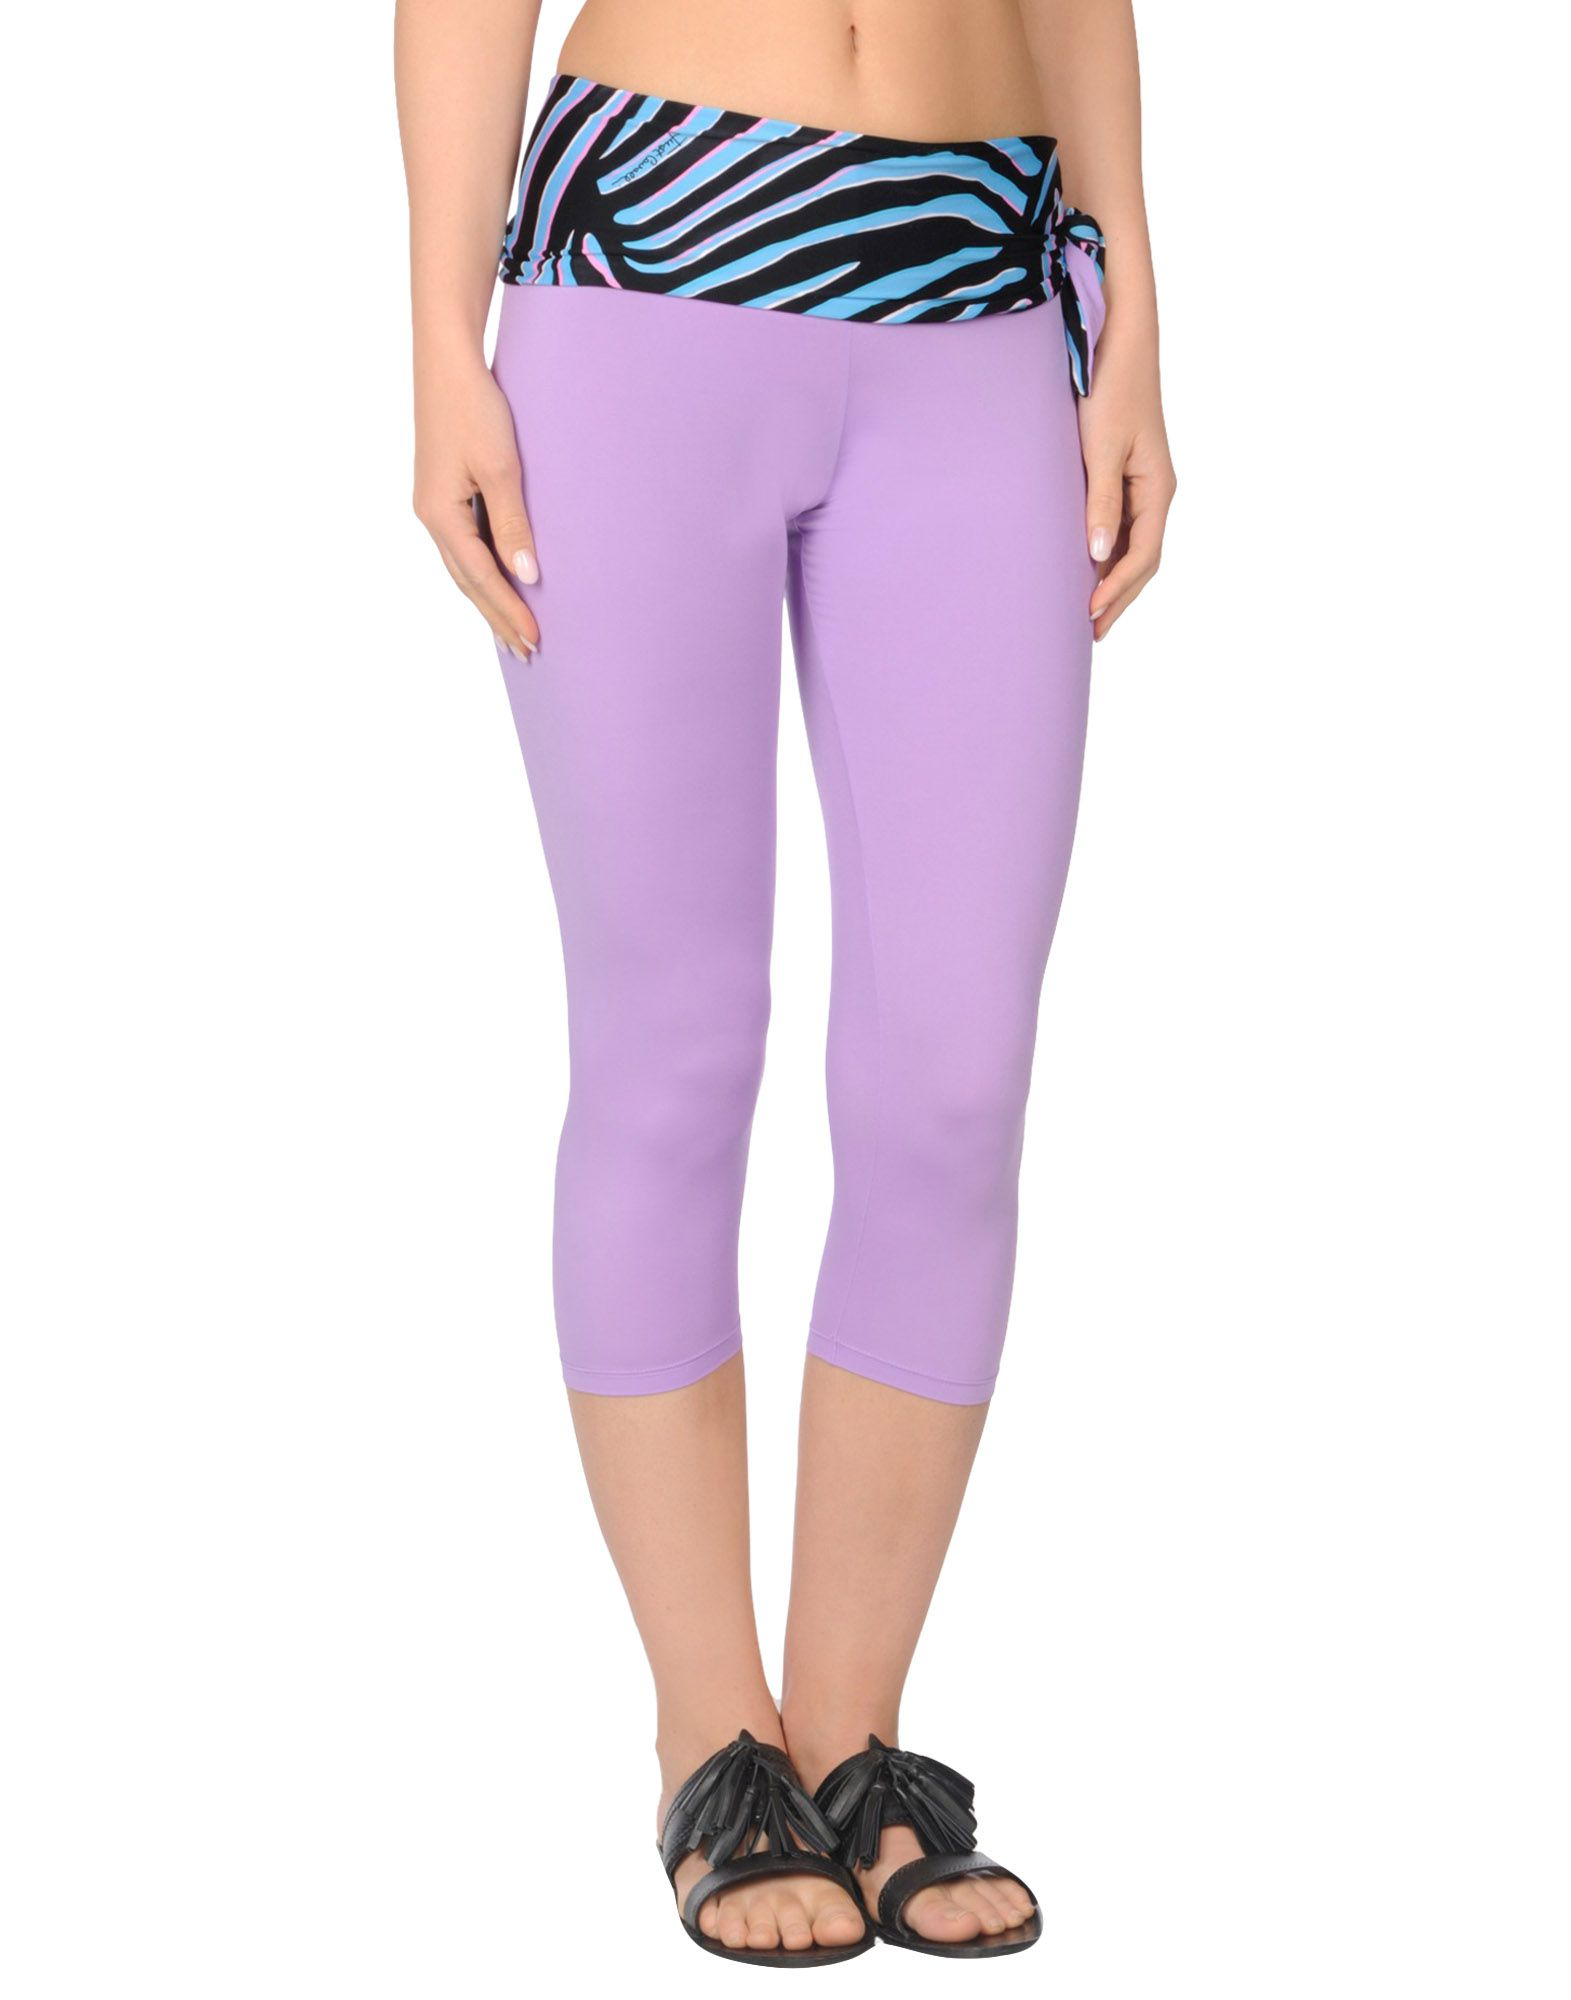 JUST CAVALLI BEACHWEAR Пляжные брюки и шорты цены онлайн